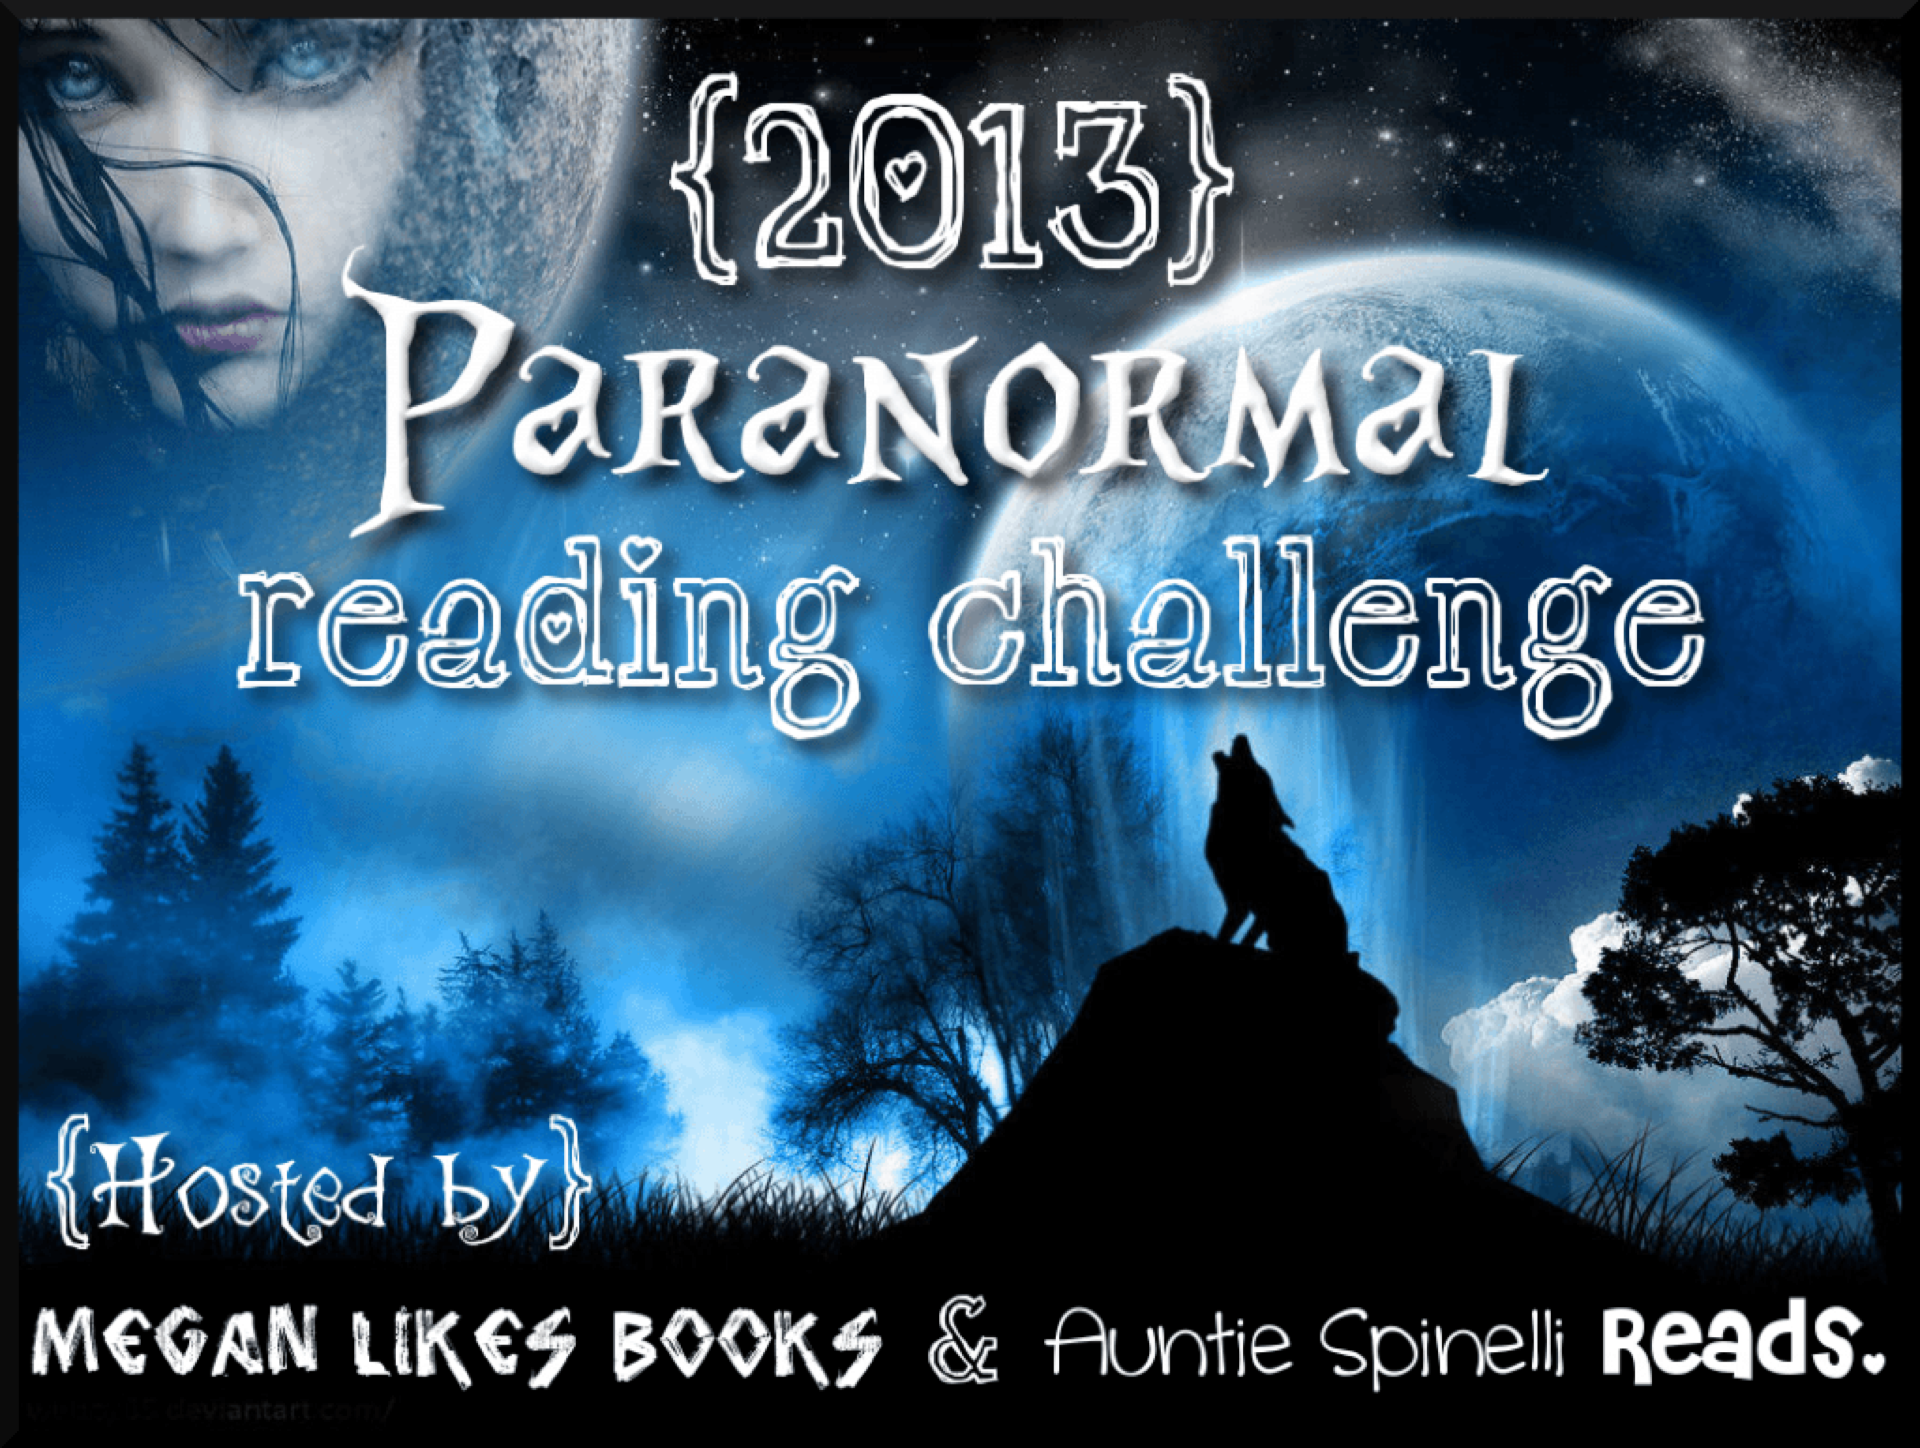 Paranormal (1920).png